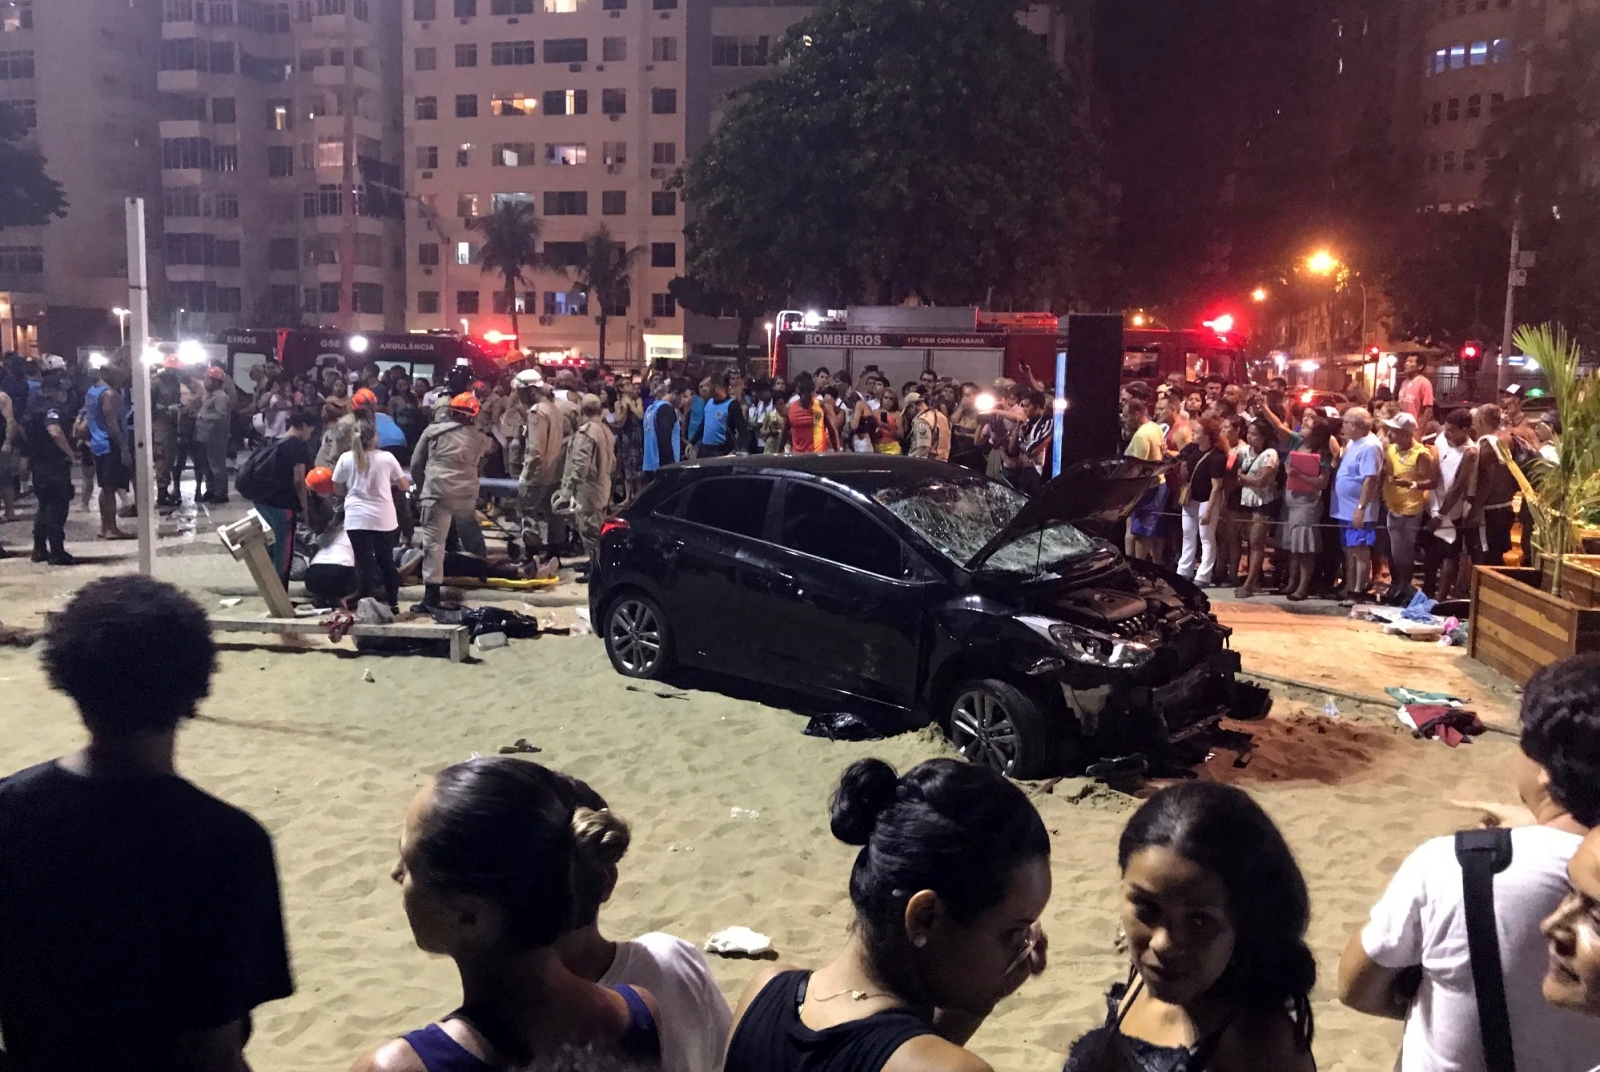 Copacabana beach incident